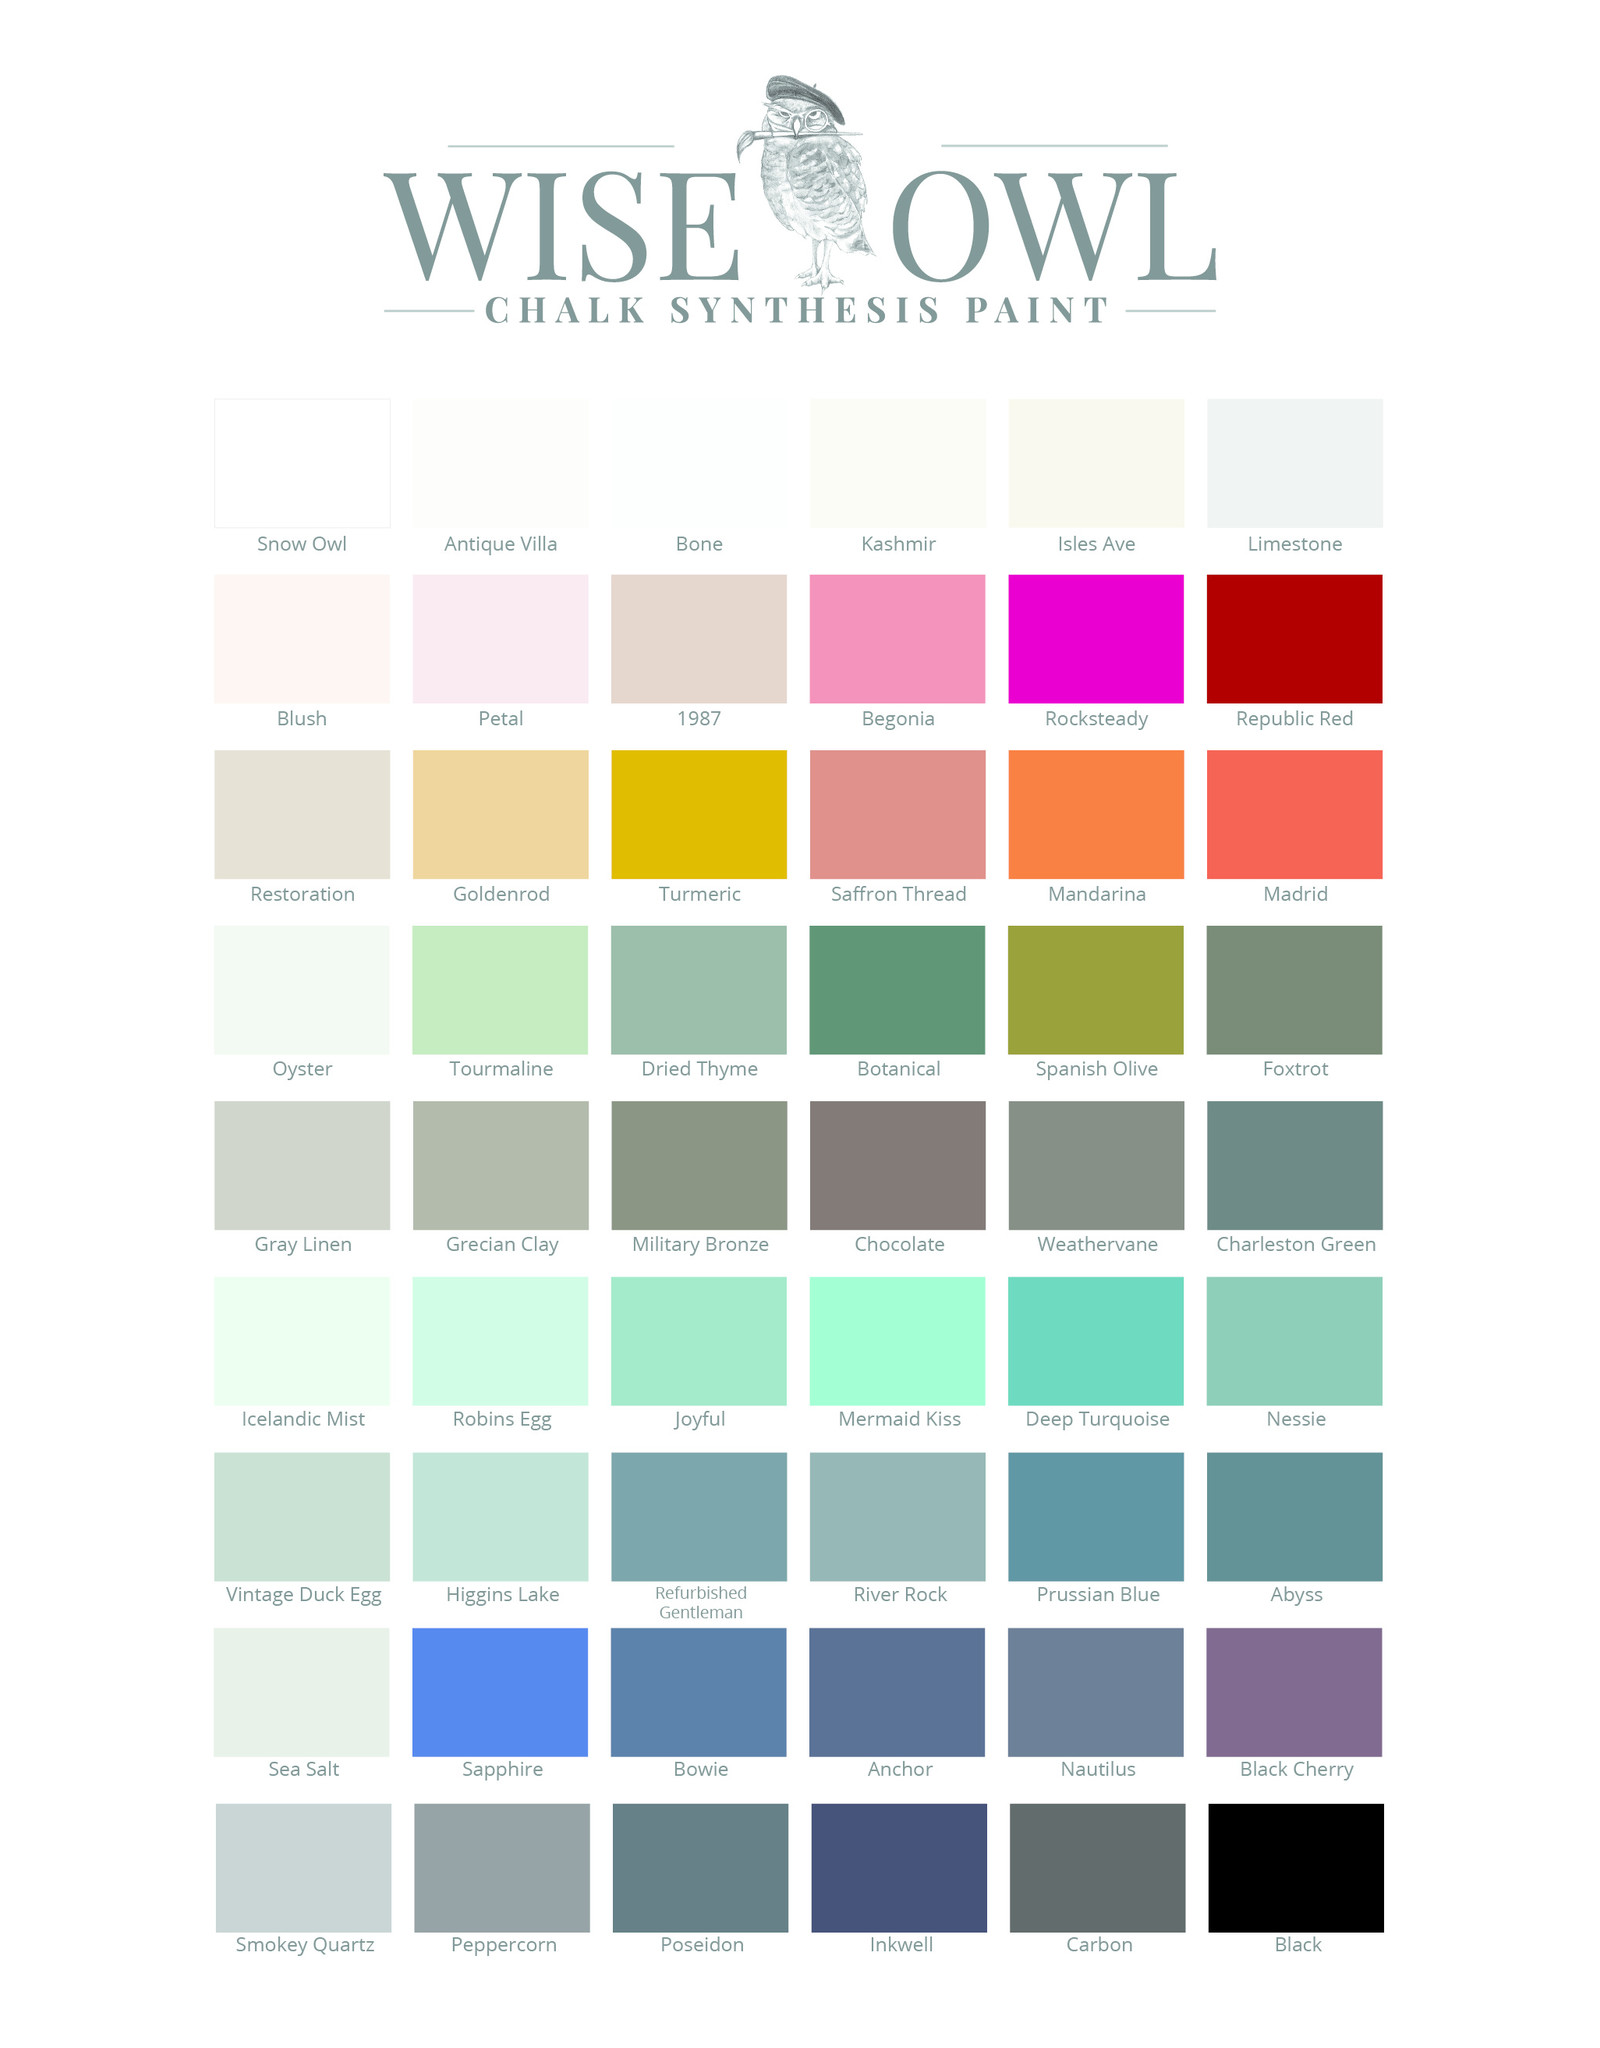 Wise Owl Paint Chalk Synthesis Paint-Nautilus Pint